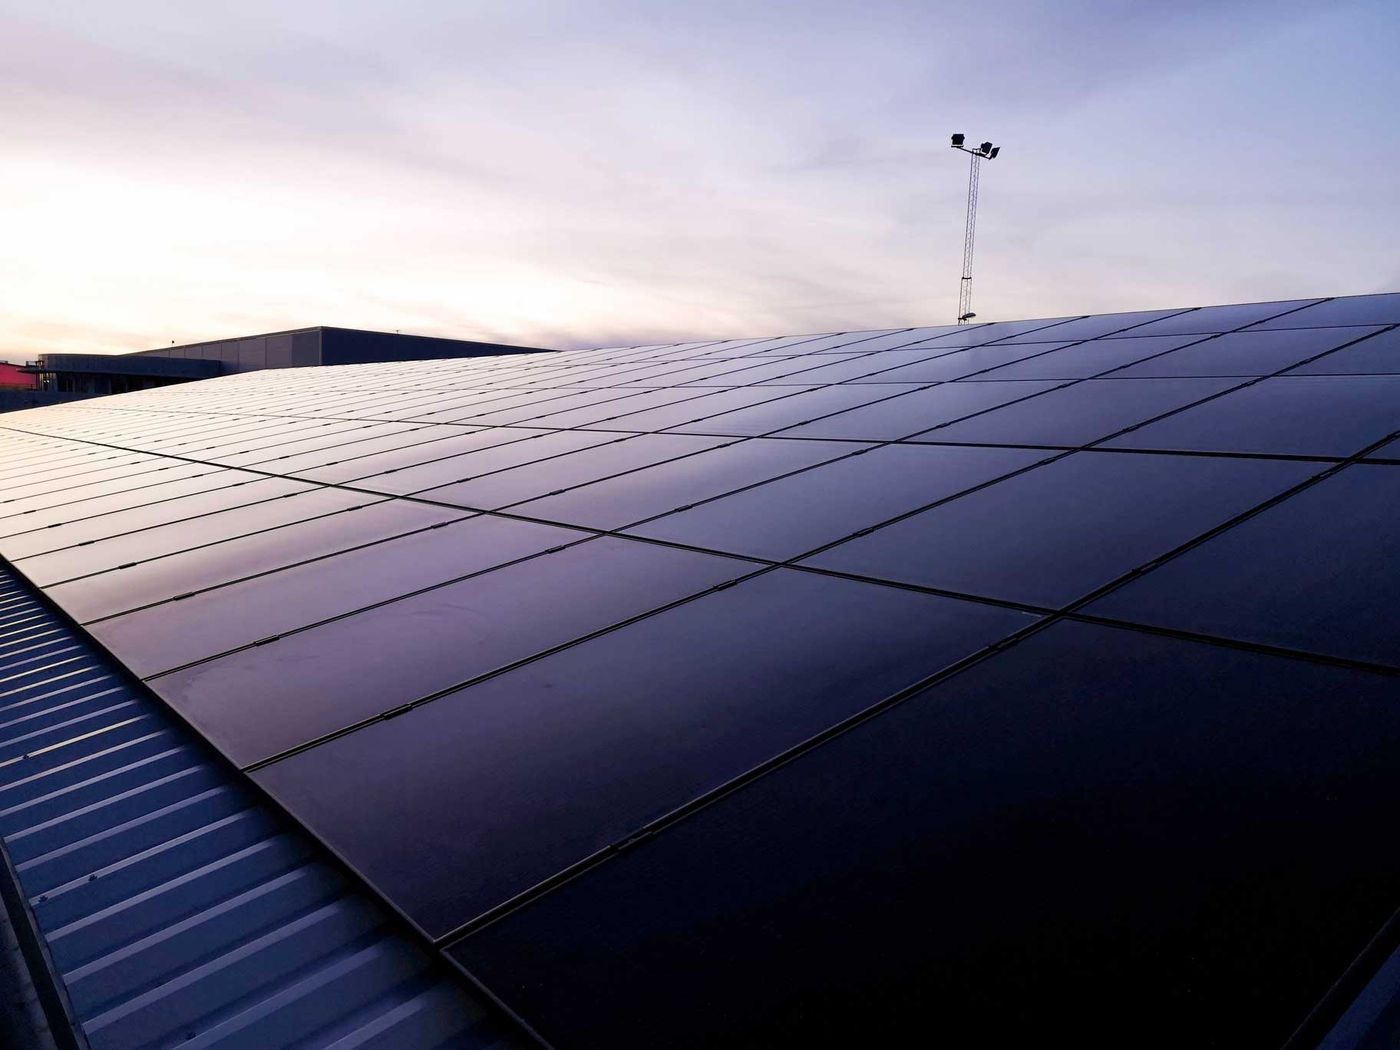 solceller bidrag